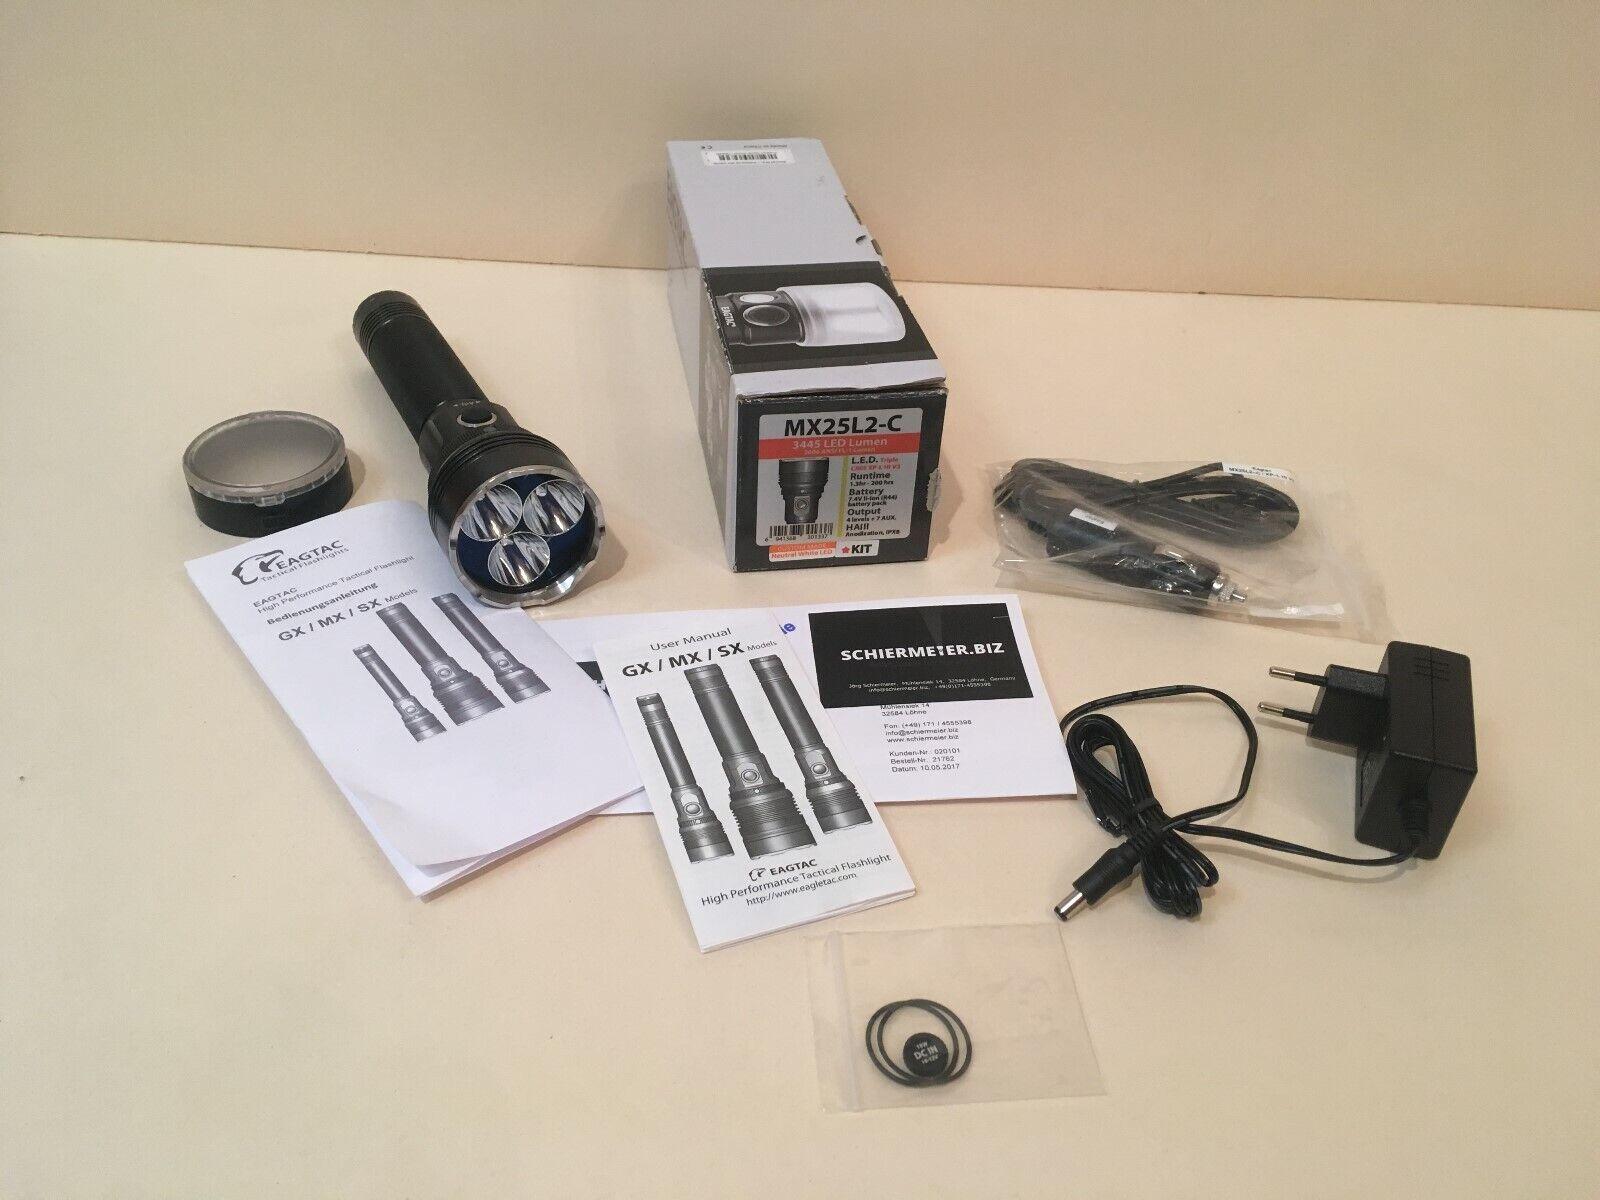 EAGTAC MX25L2-C Stablampe XP-L HI Neutral Weiß LED Custom Made TOP Taschenlampe  | Günstig